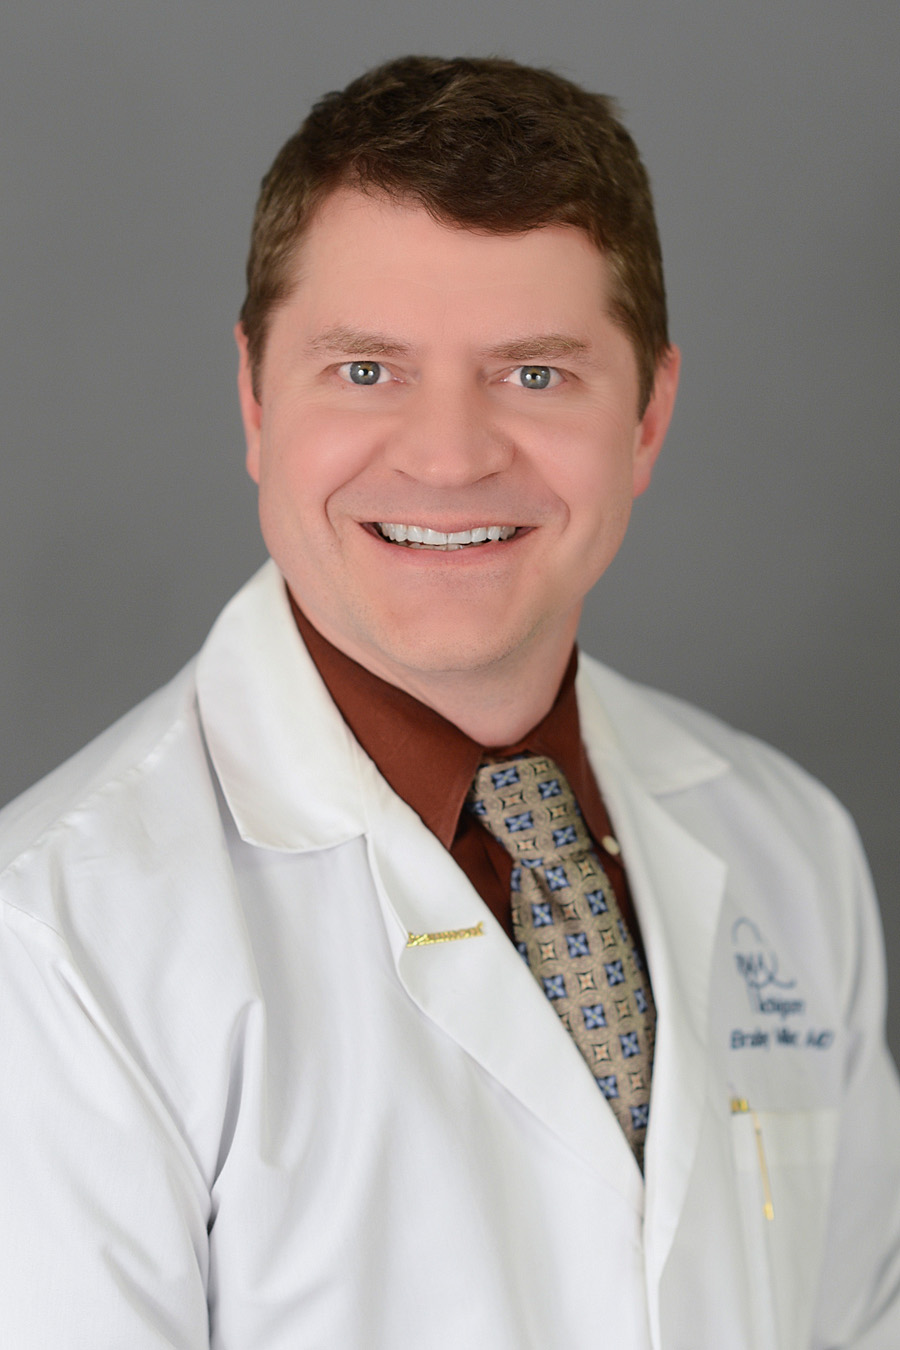 Brad Miller, MD